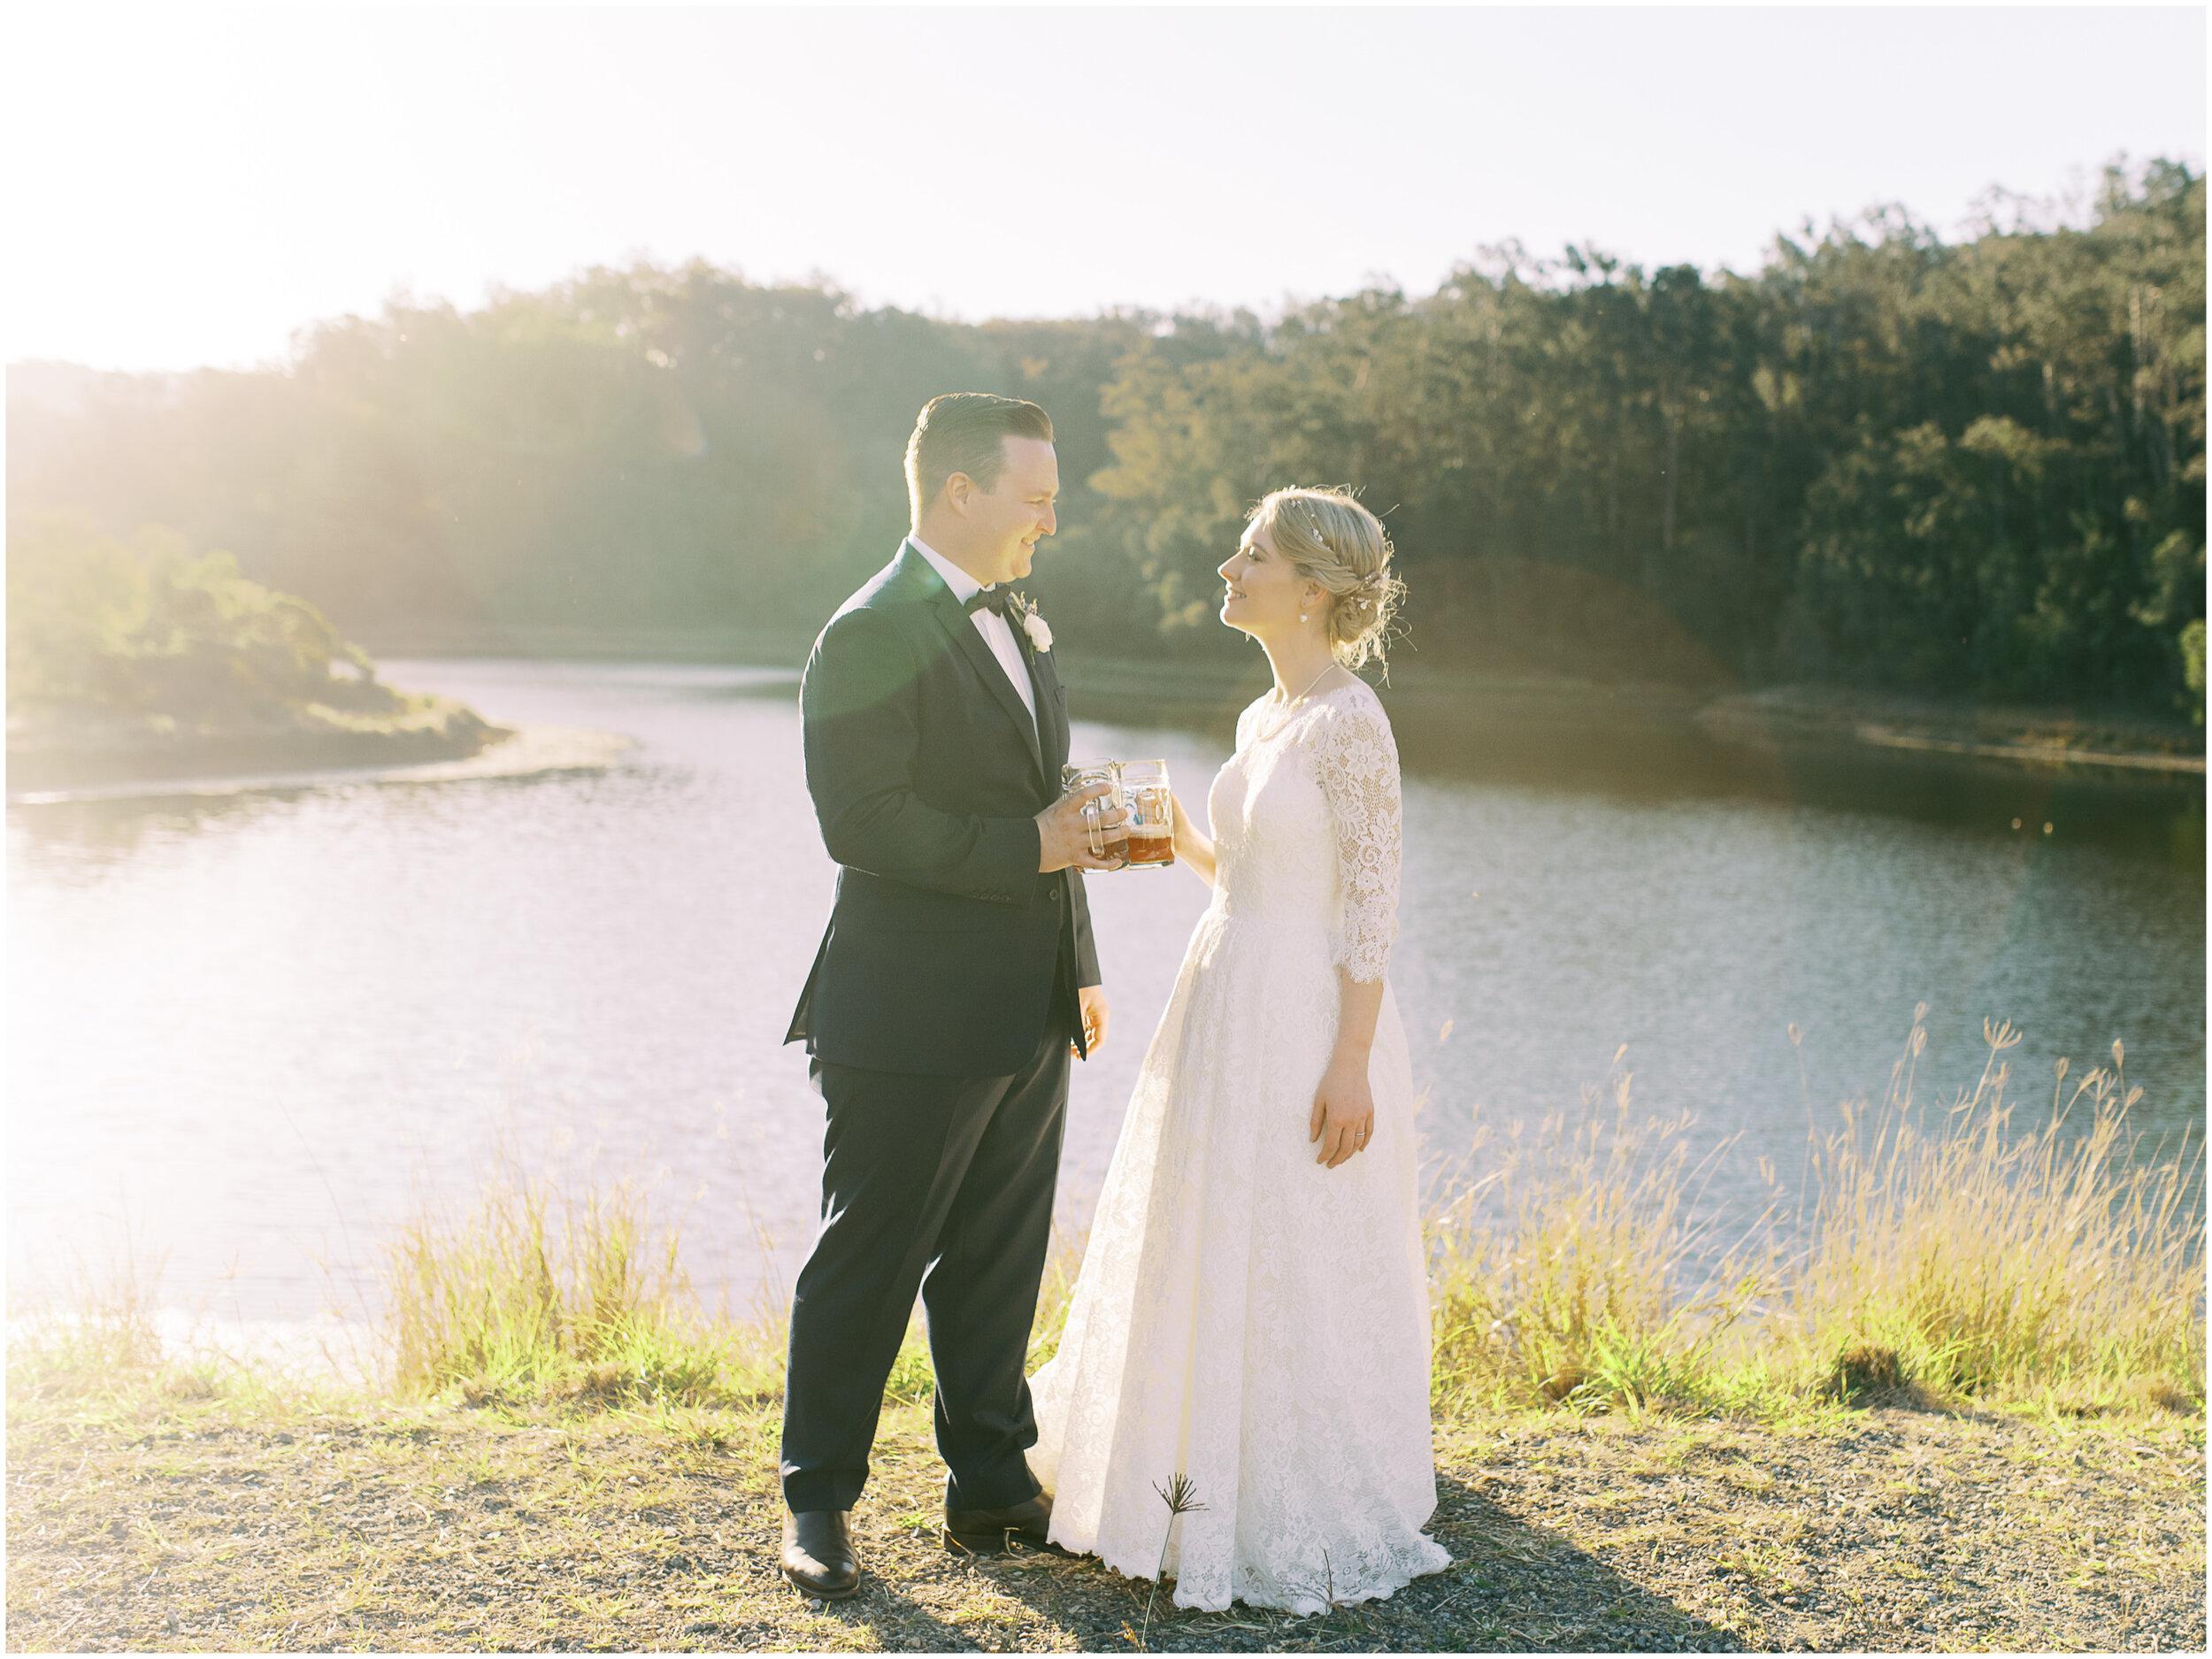 brisbane-film-wedding-photographer-lauren-olivia-luxury-wedding-australia-01-19.jpg